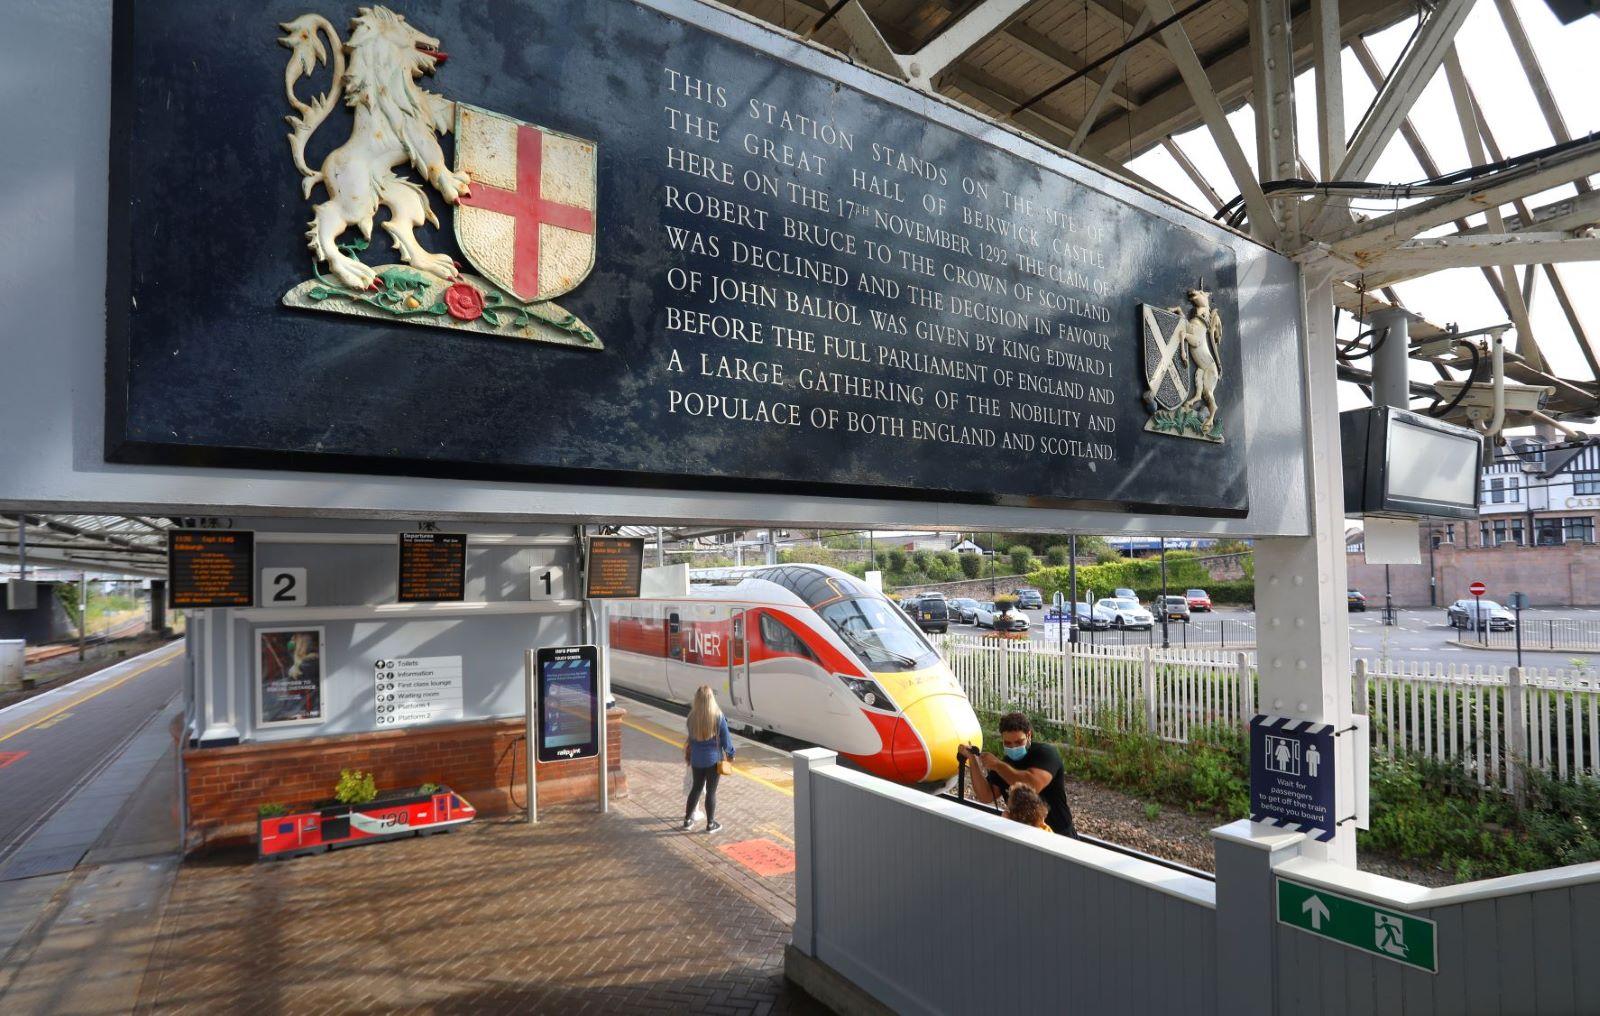 LNER Receives Railway Heritage Award For Berwick Station